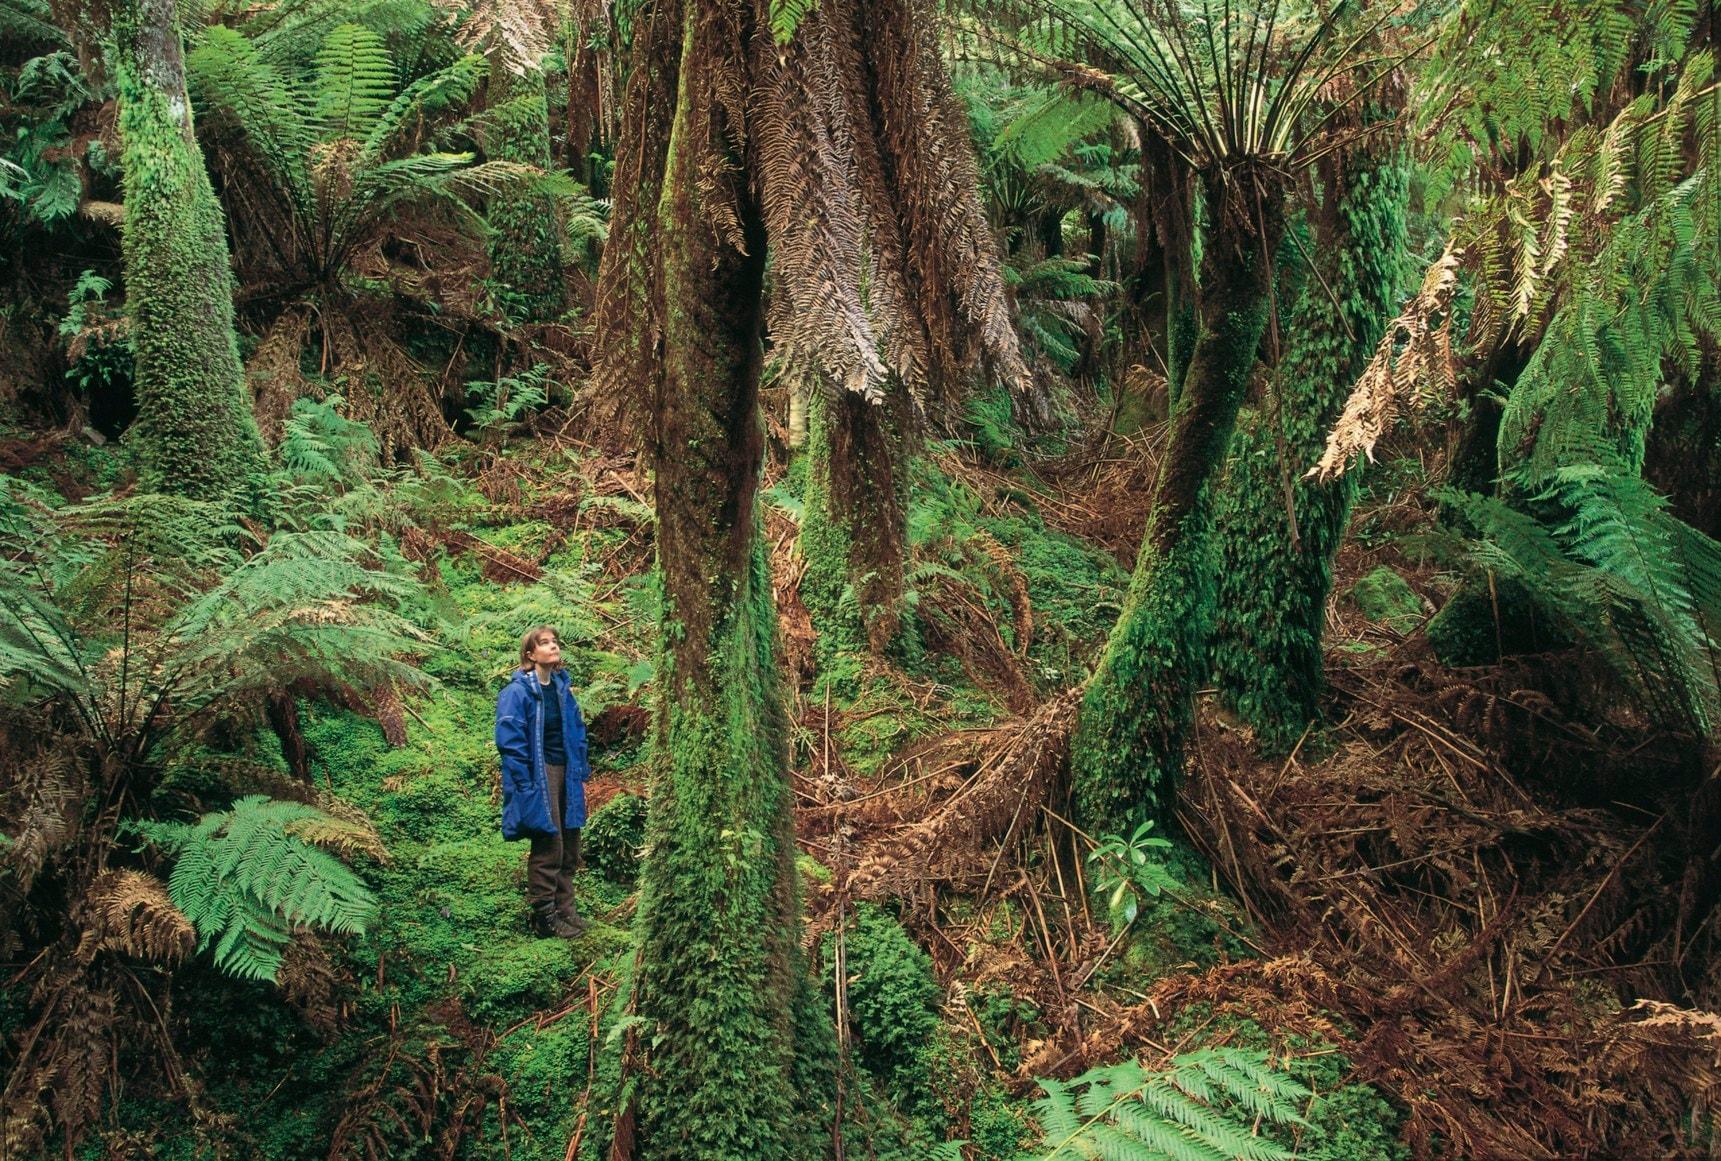 Los bosques tropicales de Australia